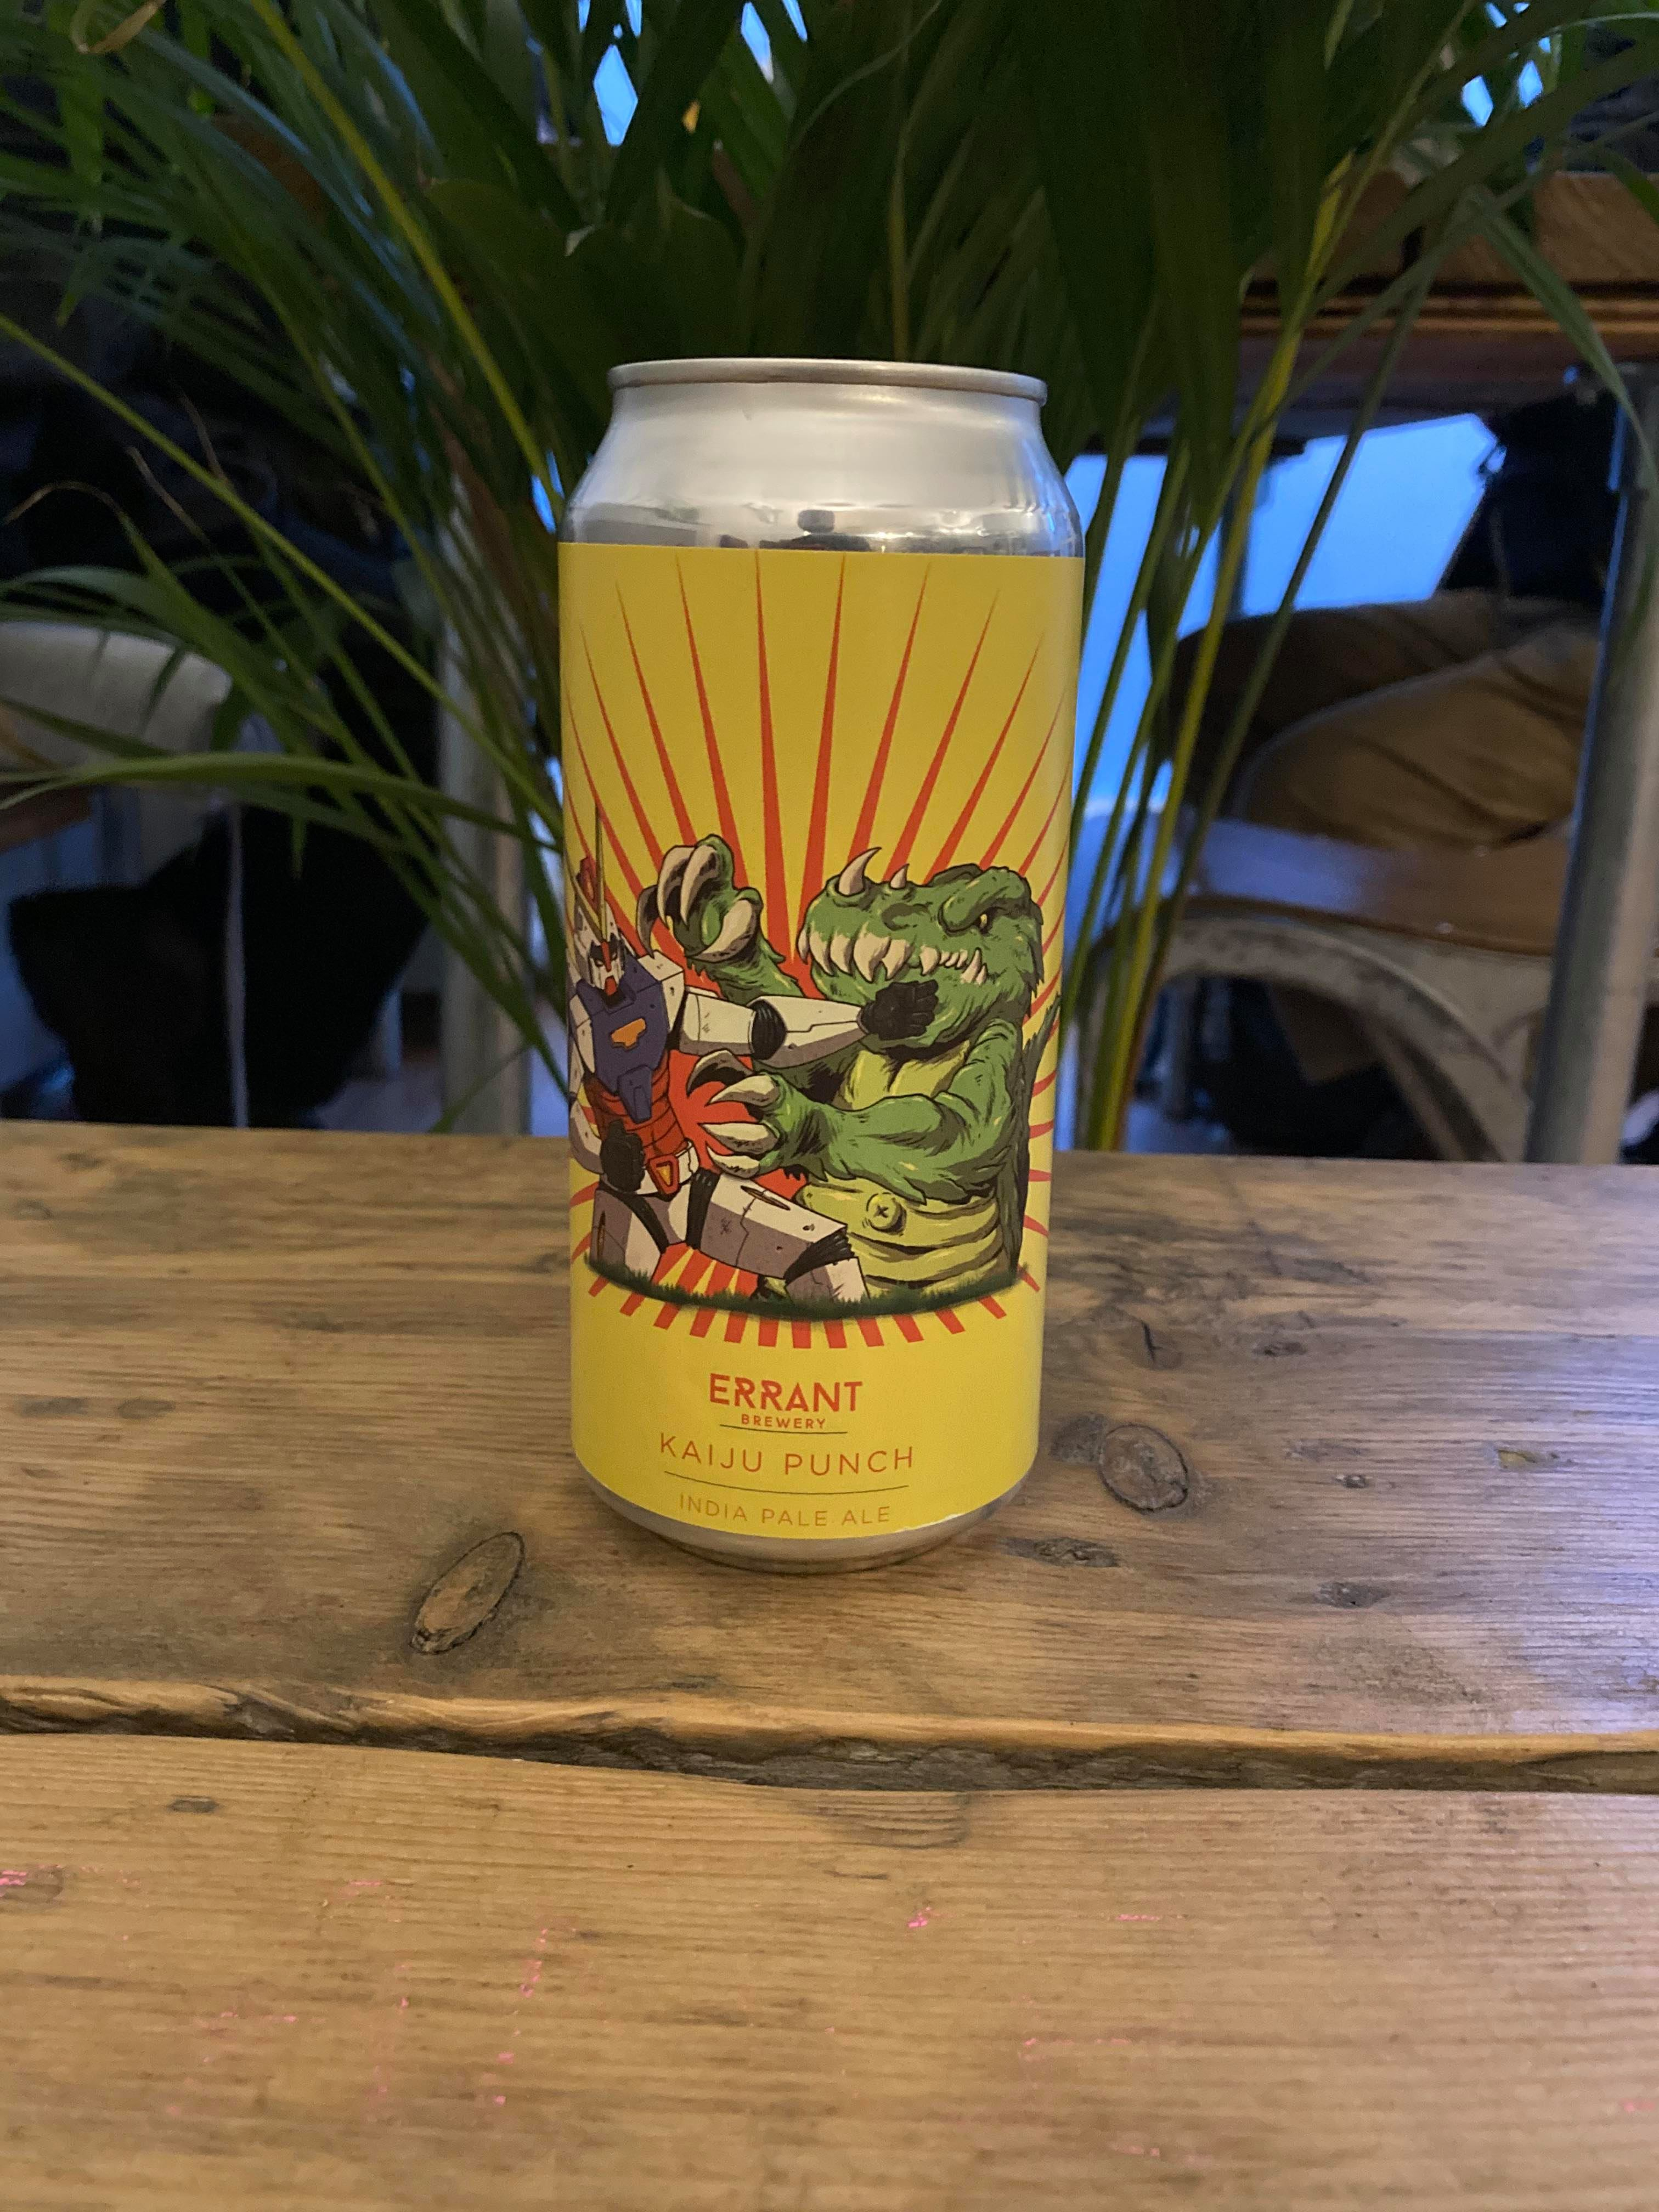 Errant - Kaiju Punch 5.7%